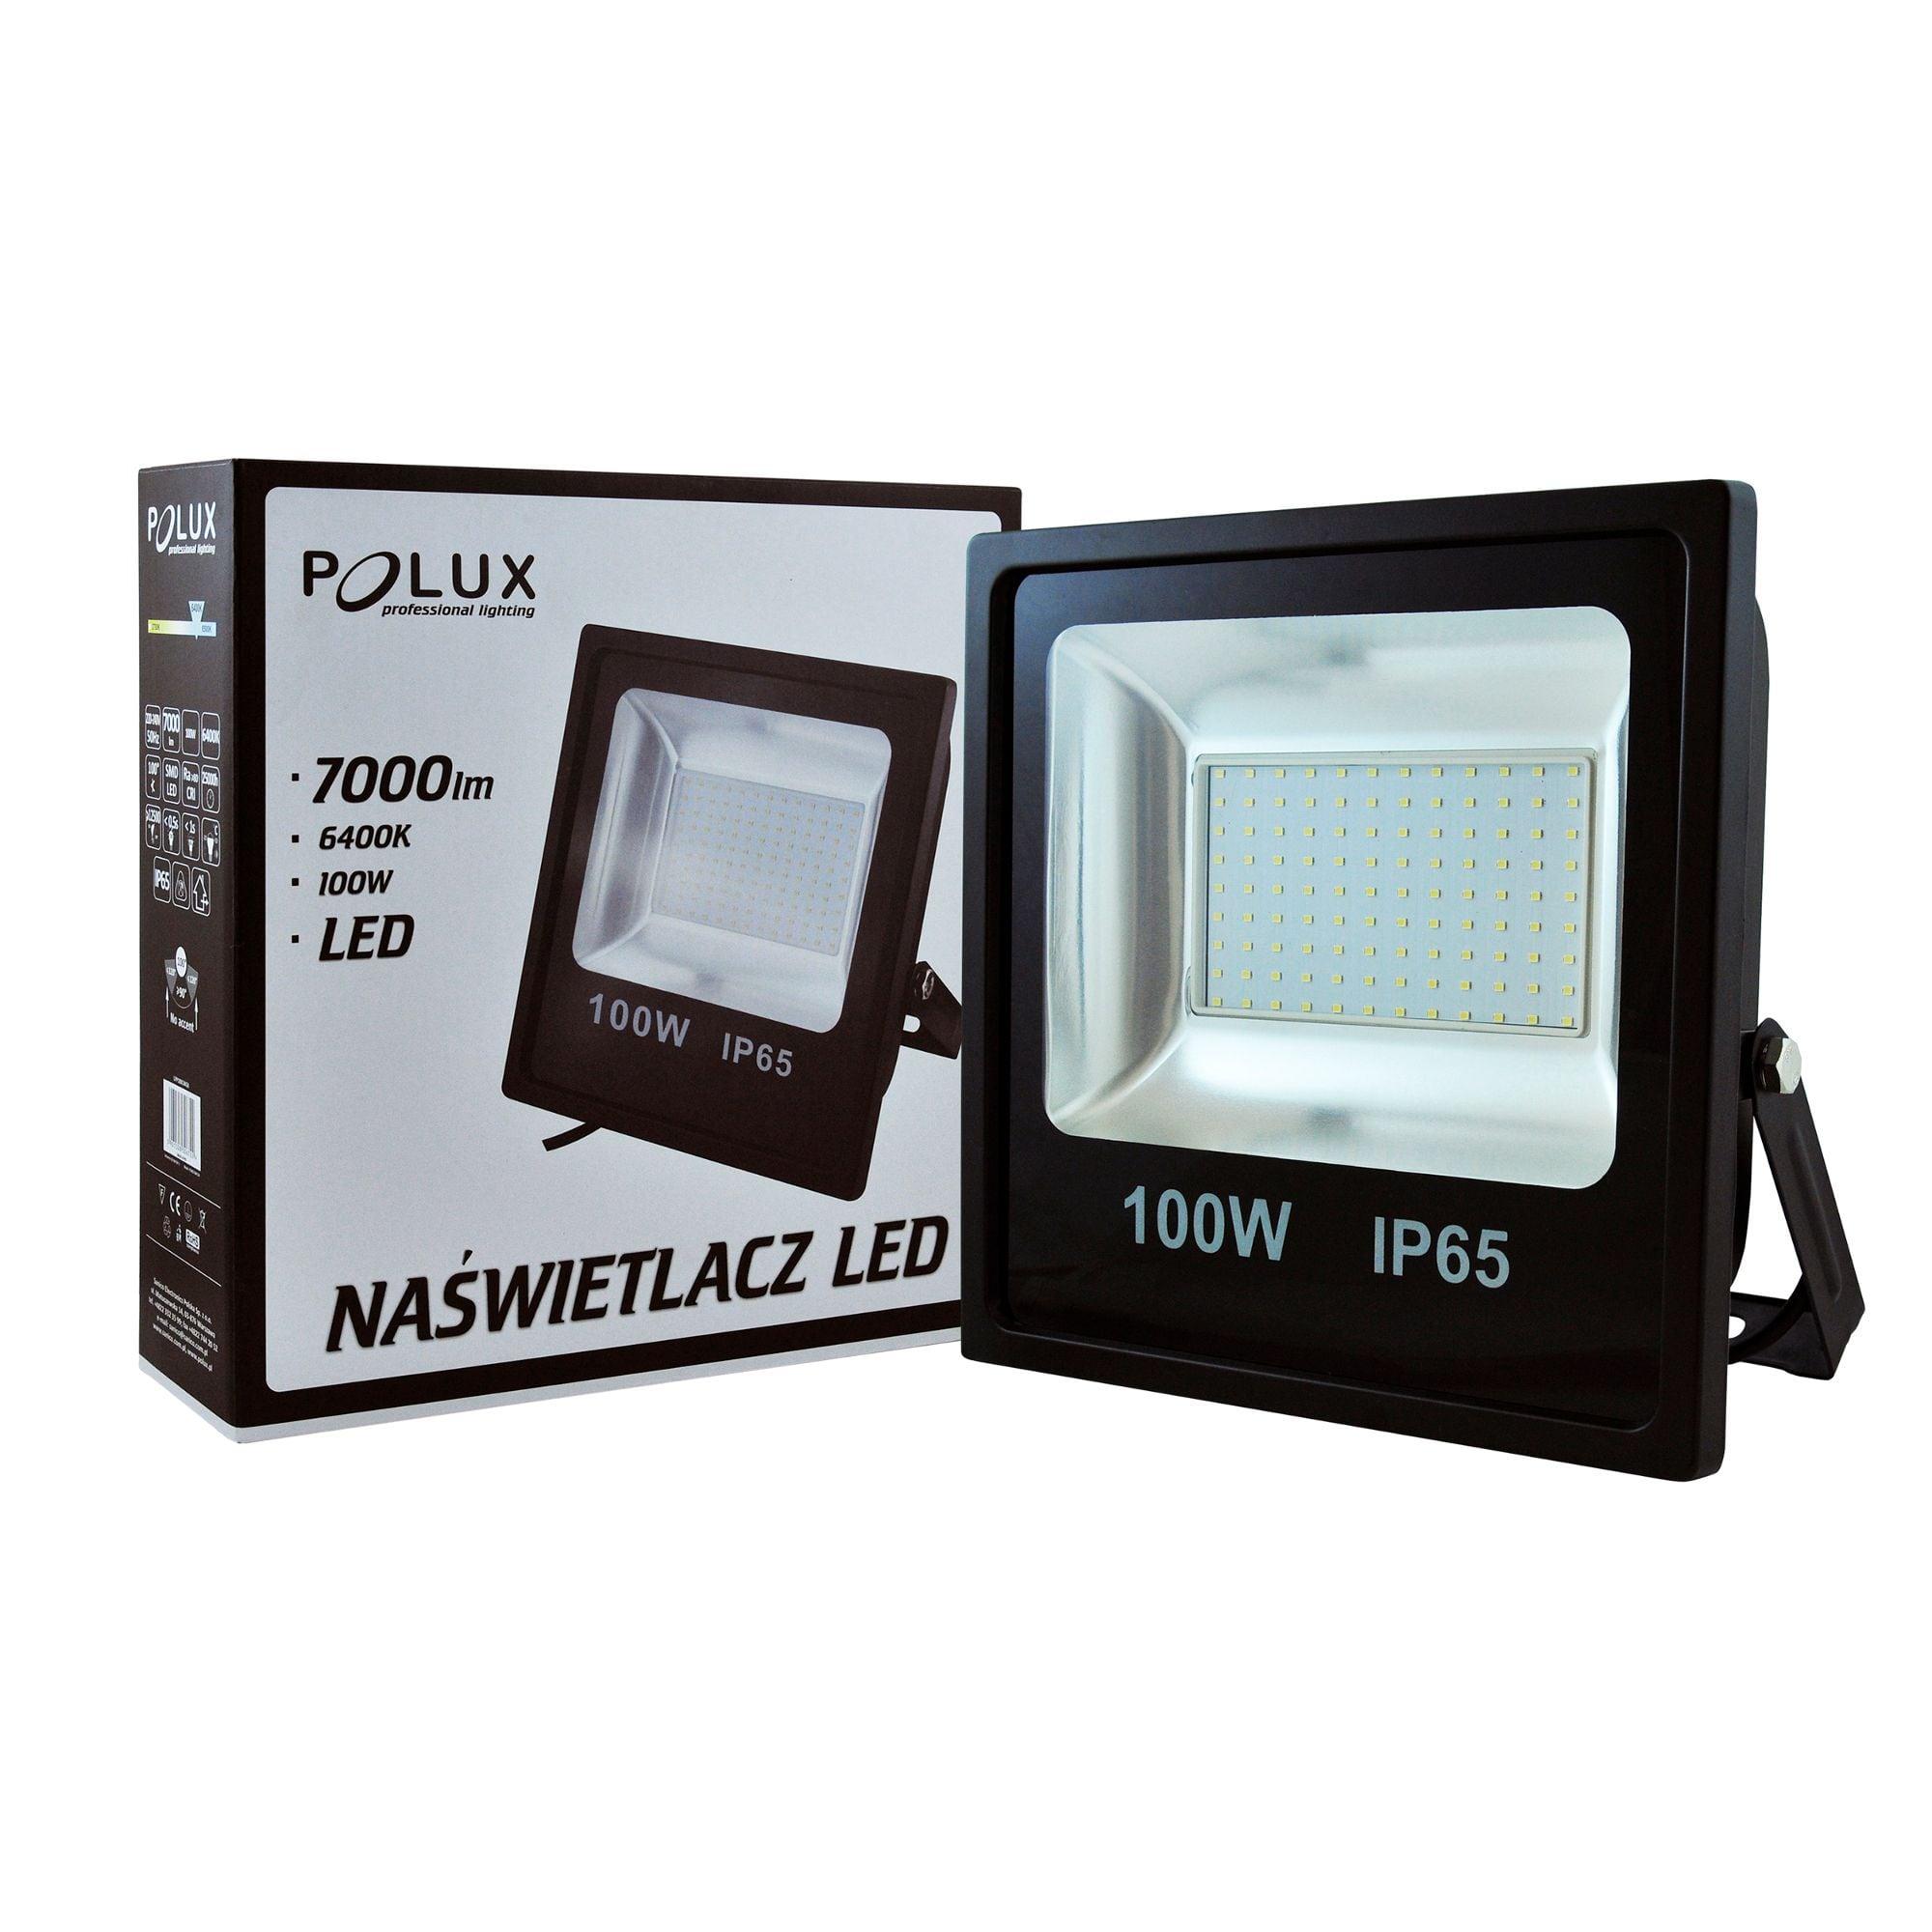 Projector LED POLUX 100W IP65 black